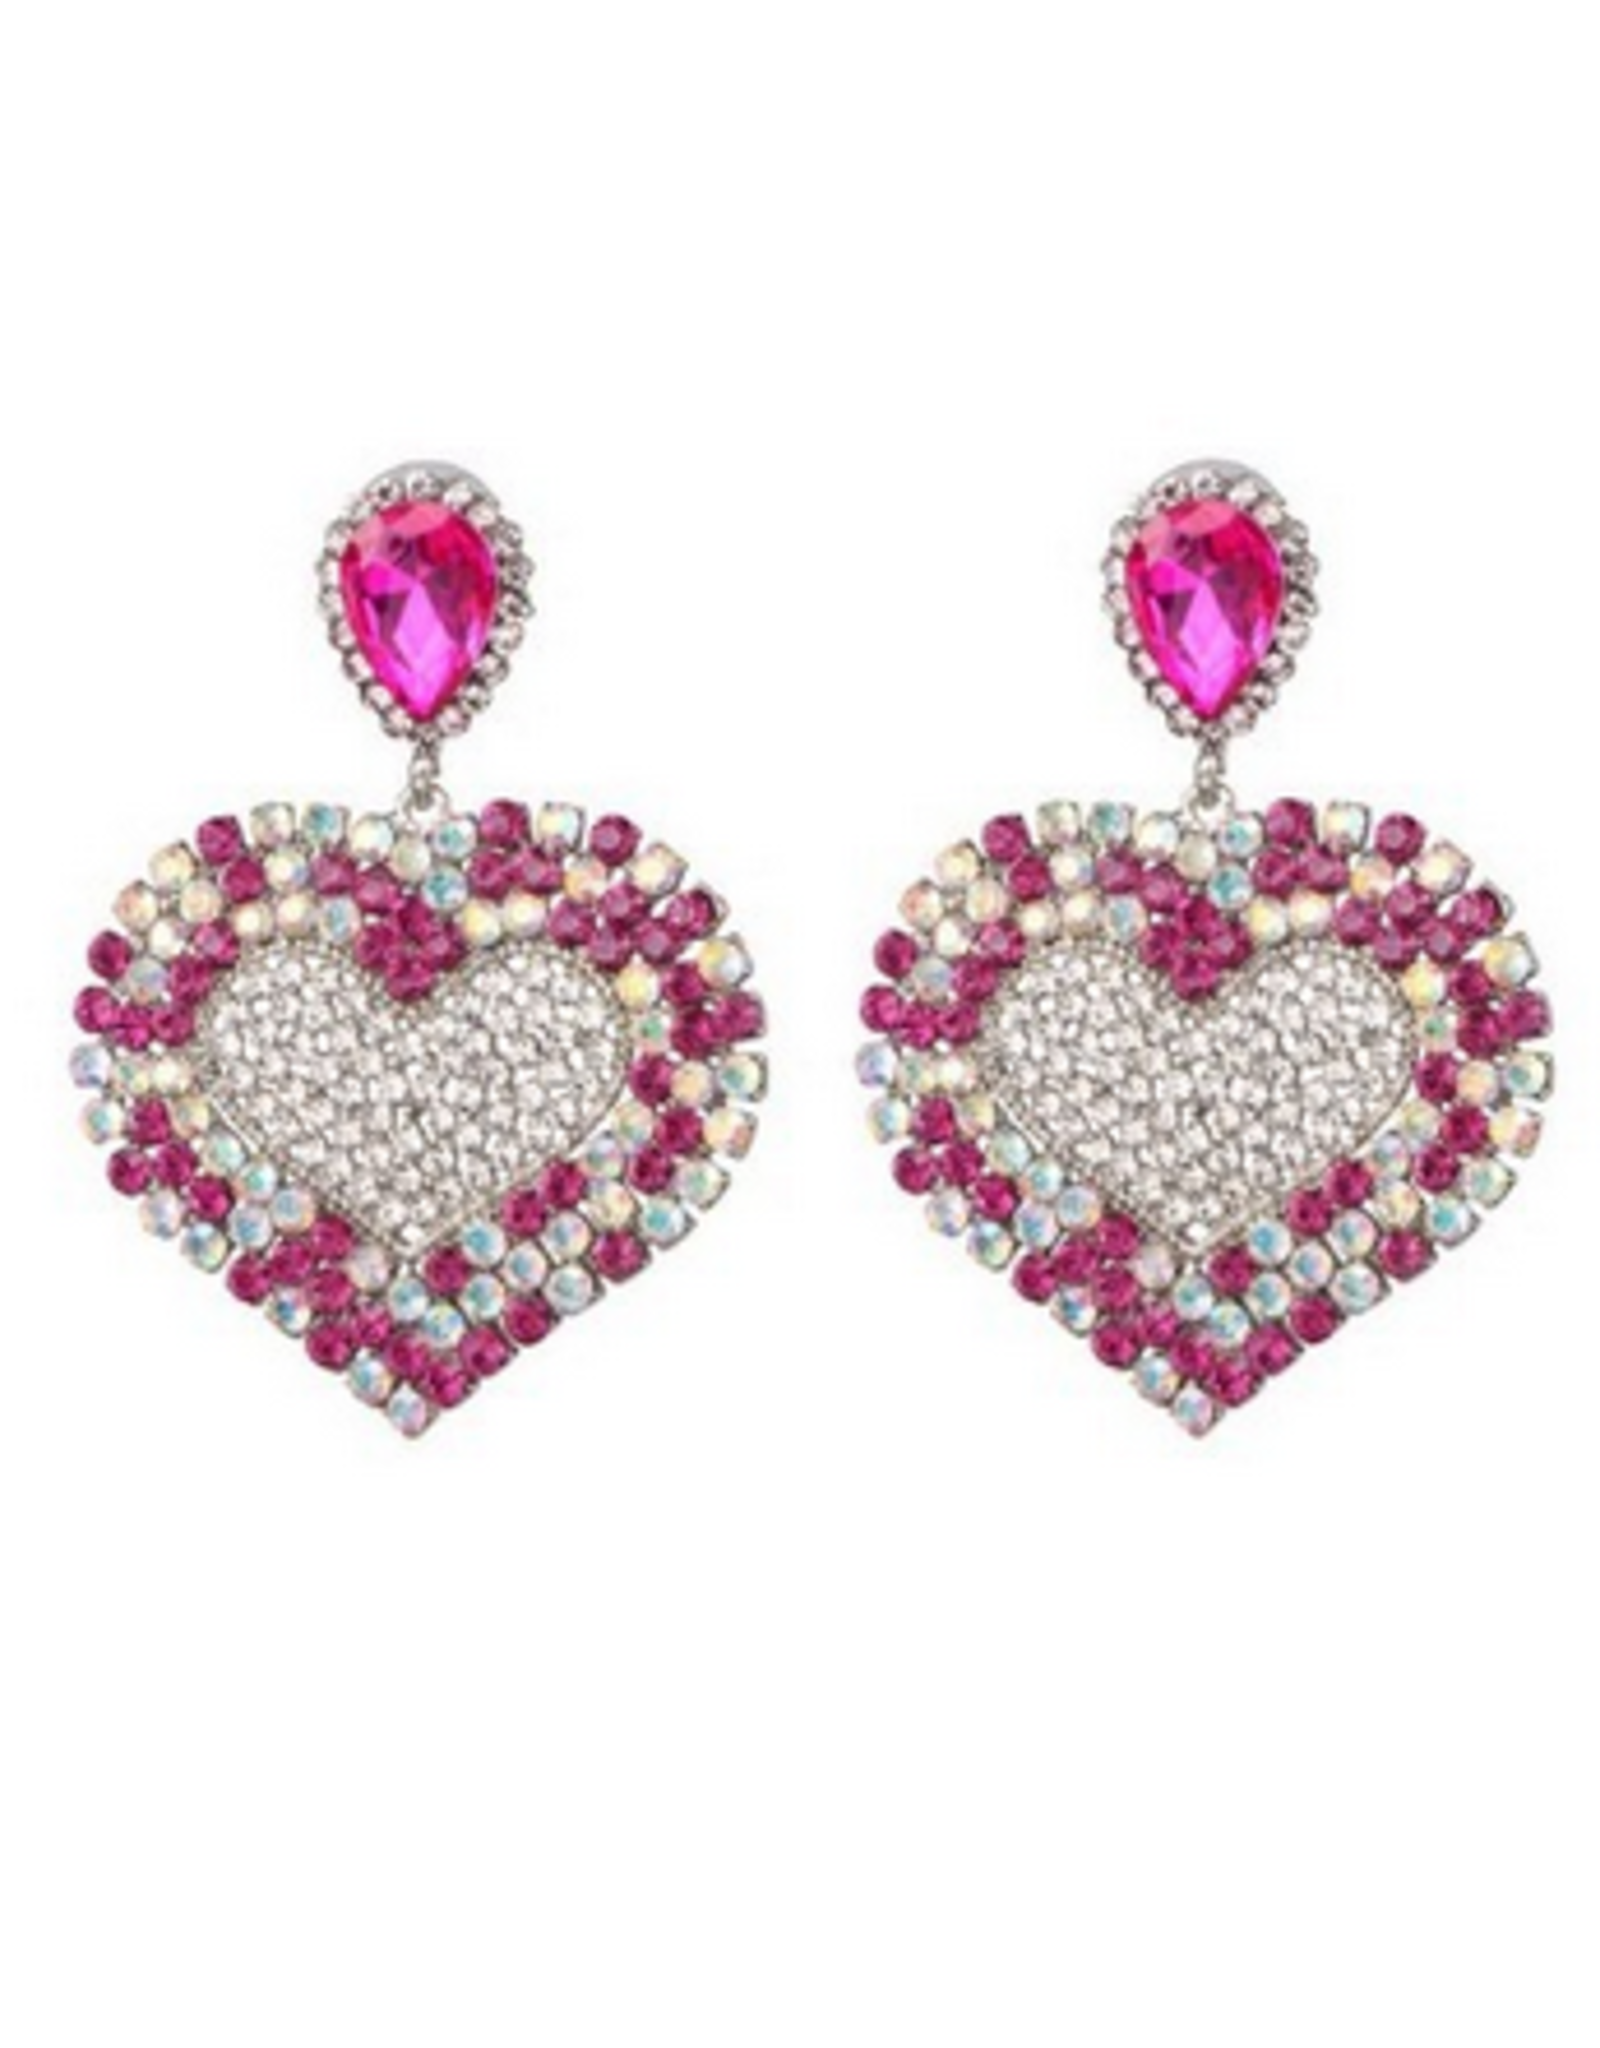 Dilworth Road Crystal heart dangle earrings